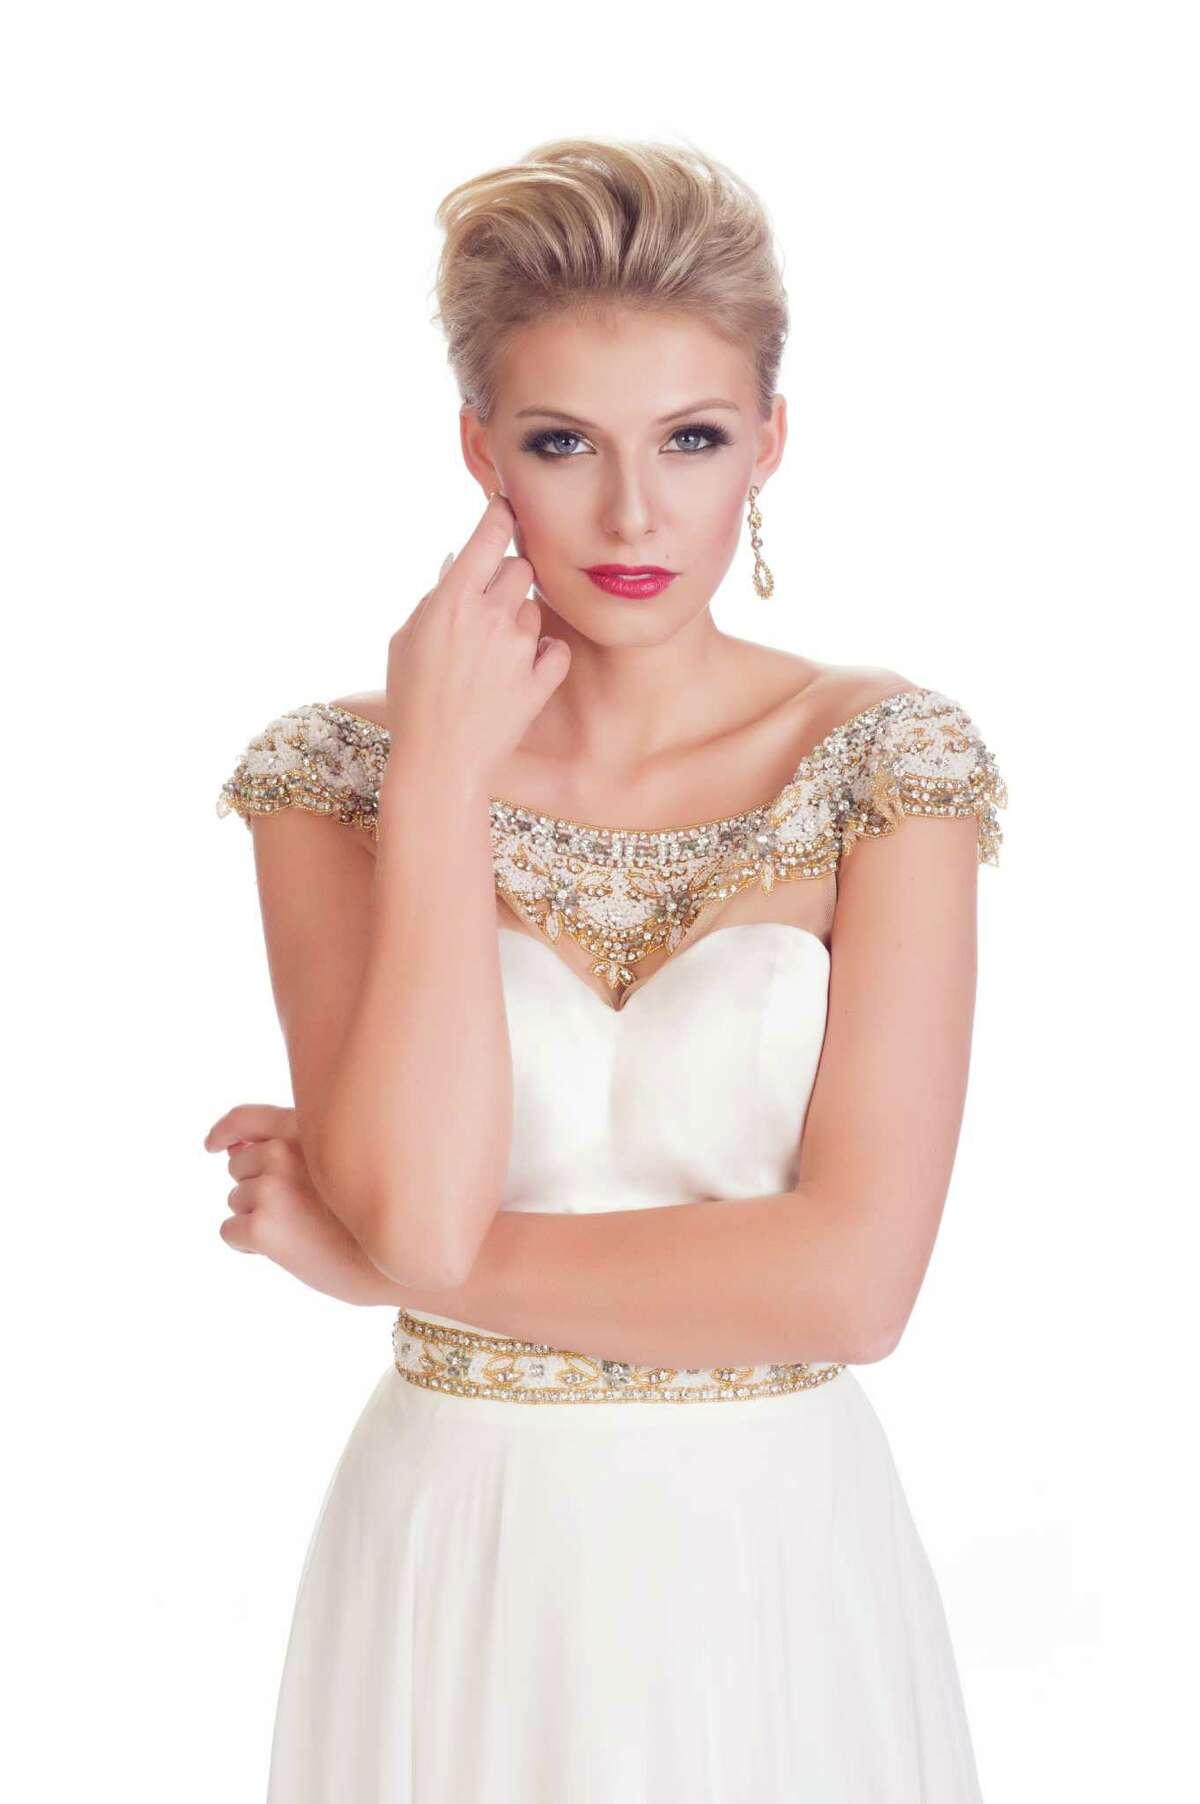 Josefin Donat, Miss Germany.